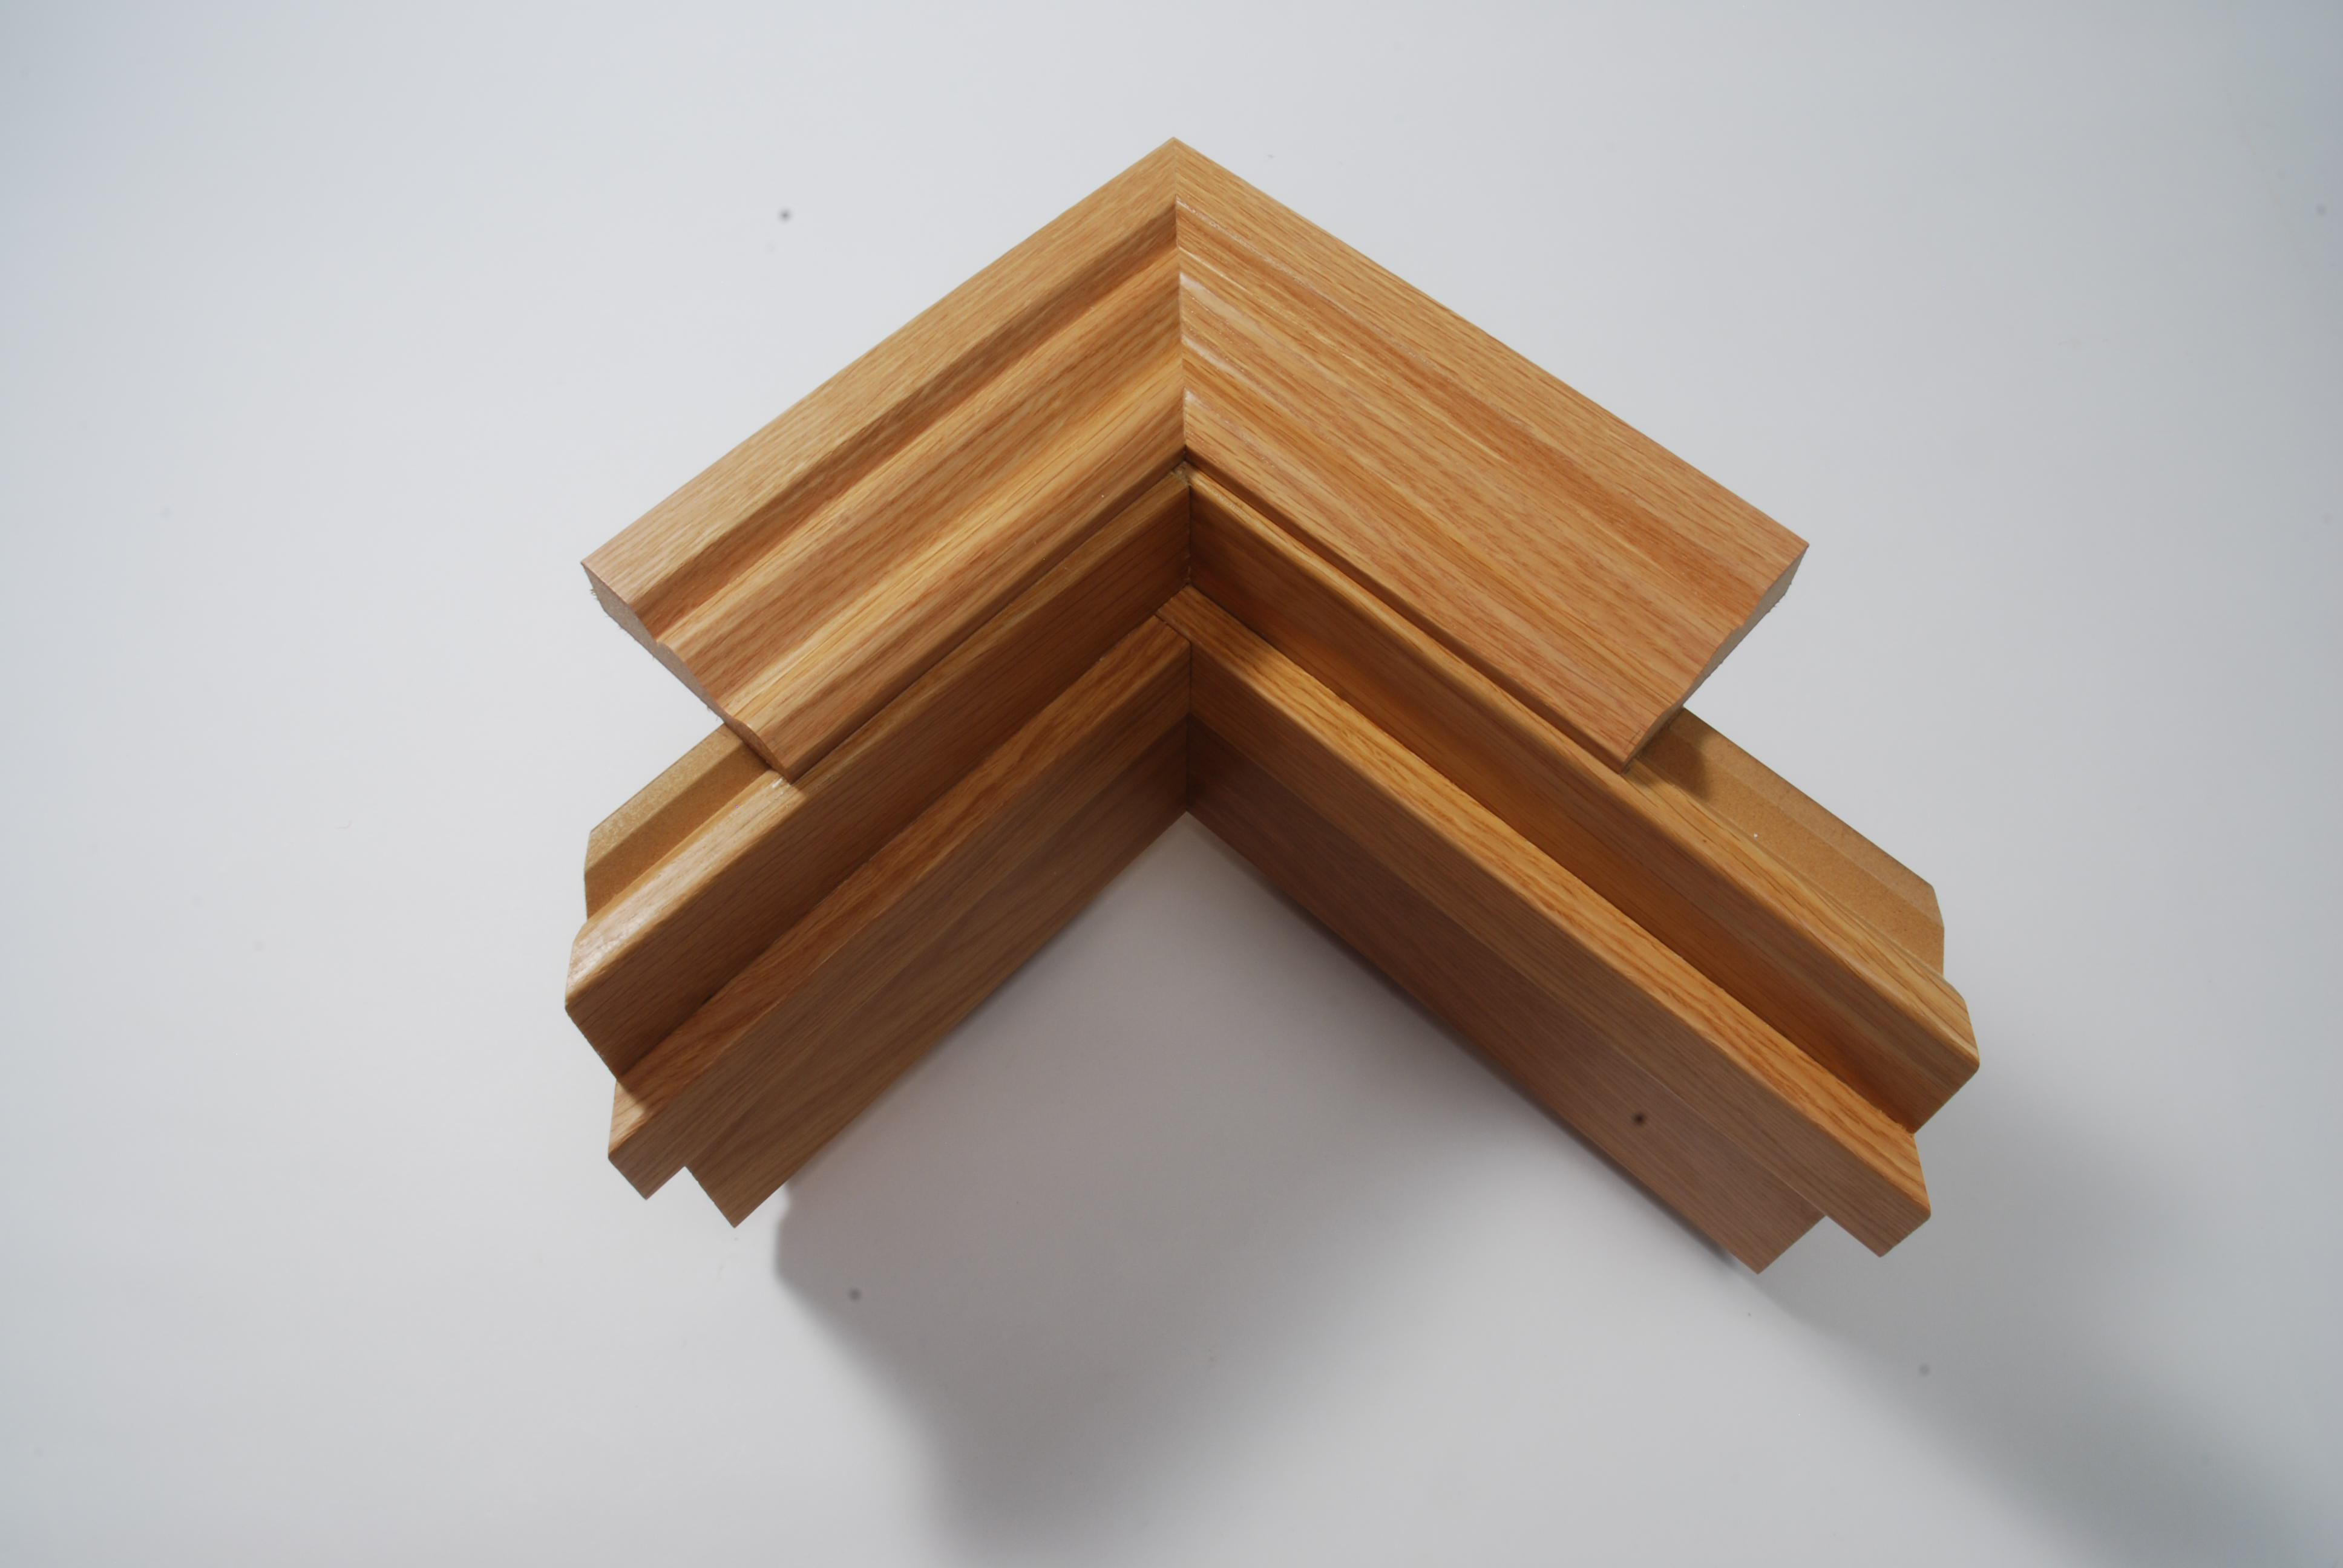 Fire Fully Adjustable Door Lining Set 30mm x 156 - 220mm Veneered American White Oak (Special Offer)